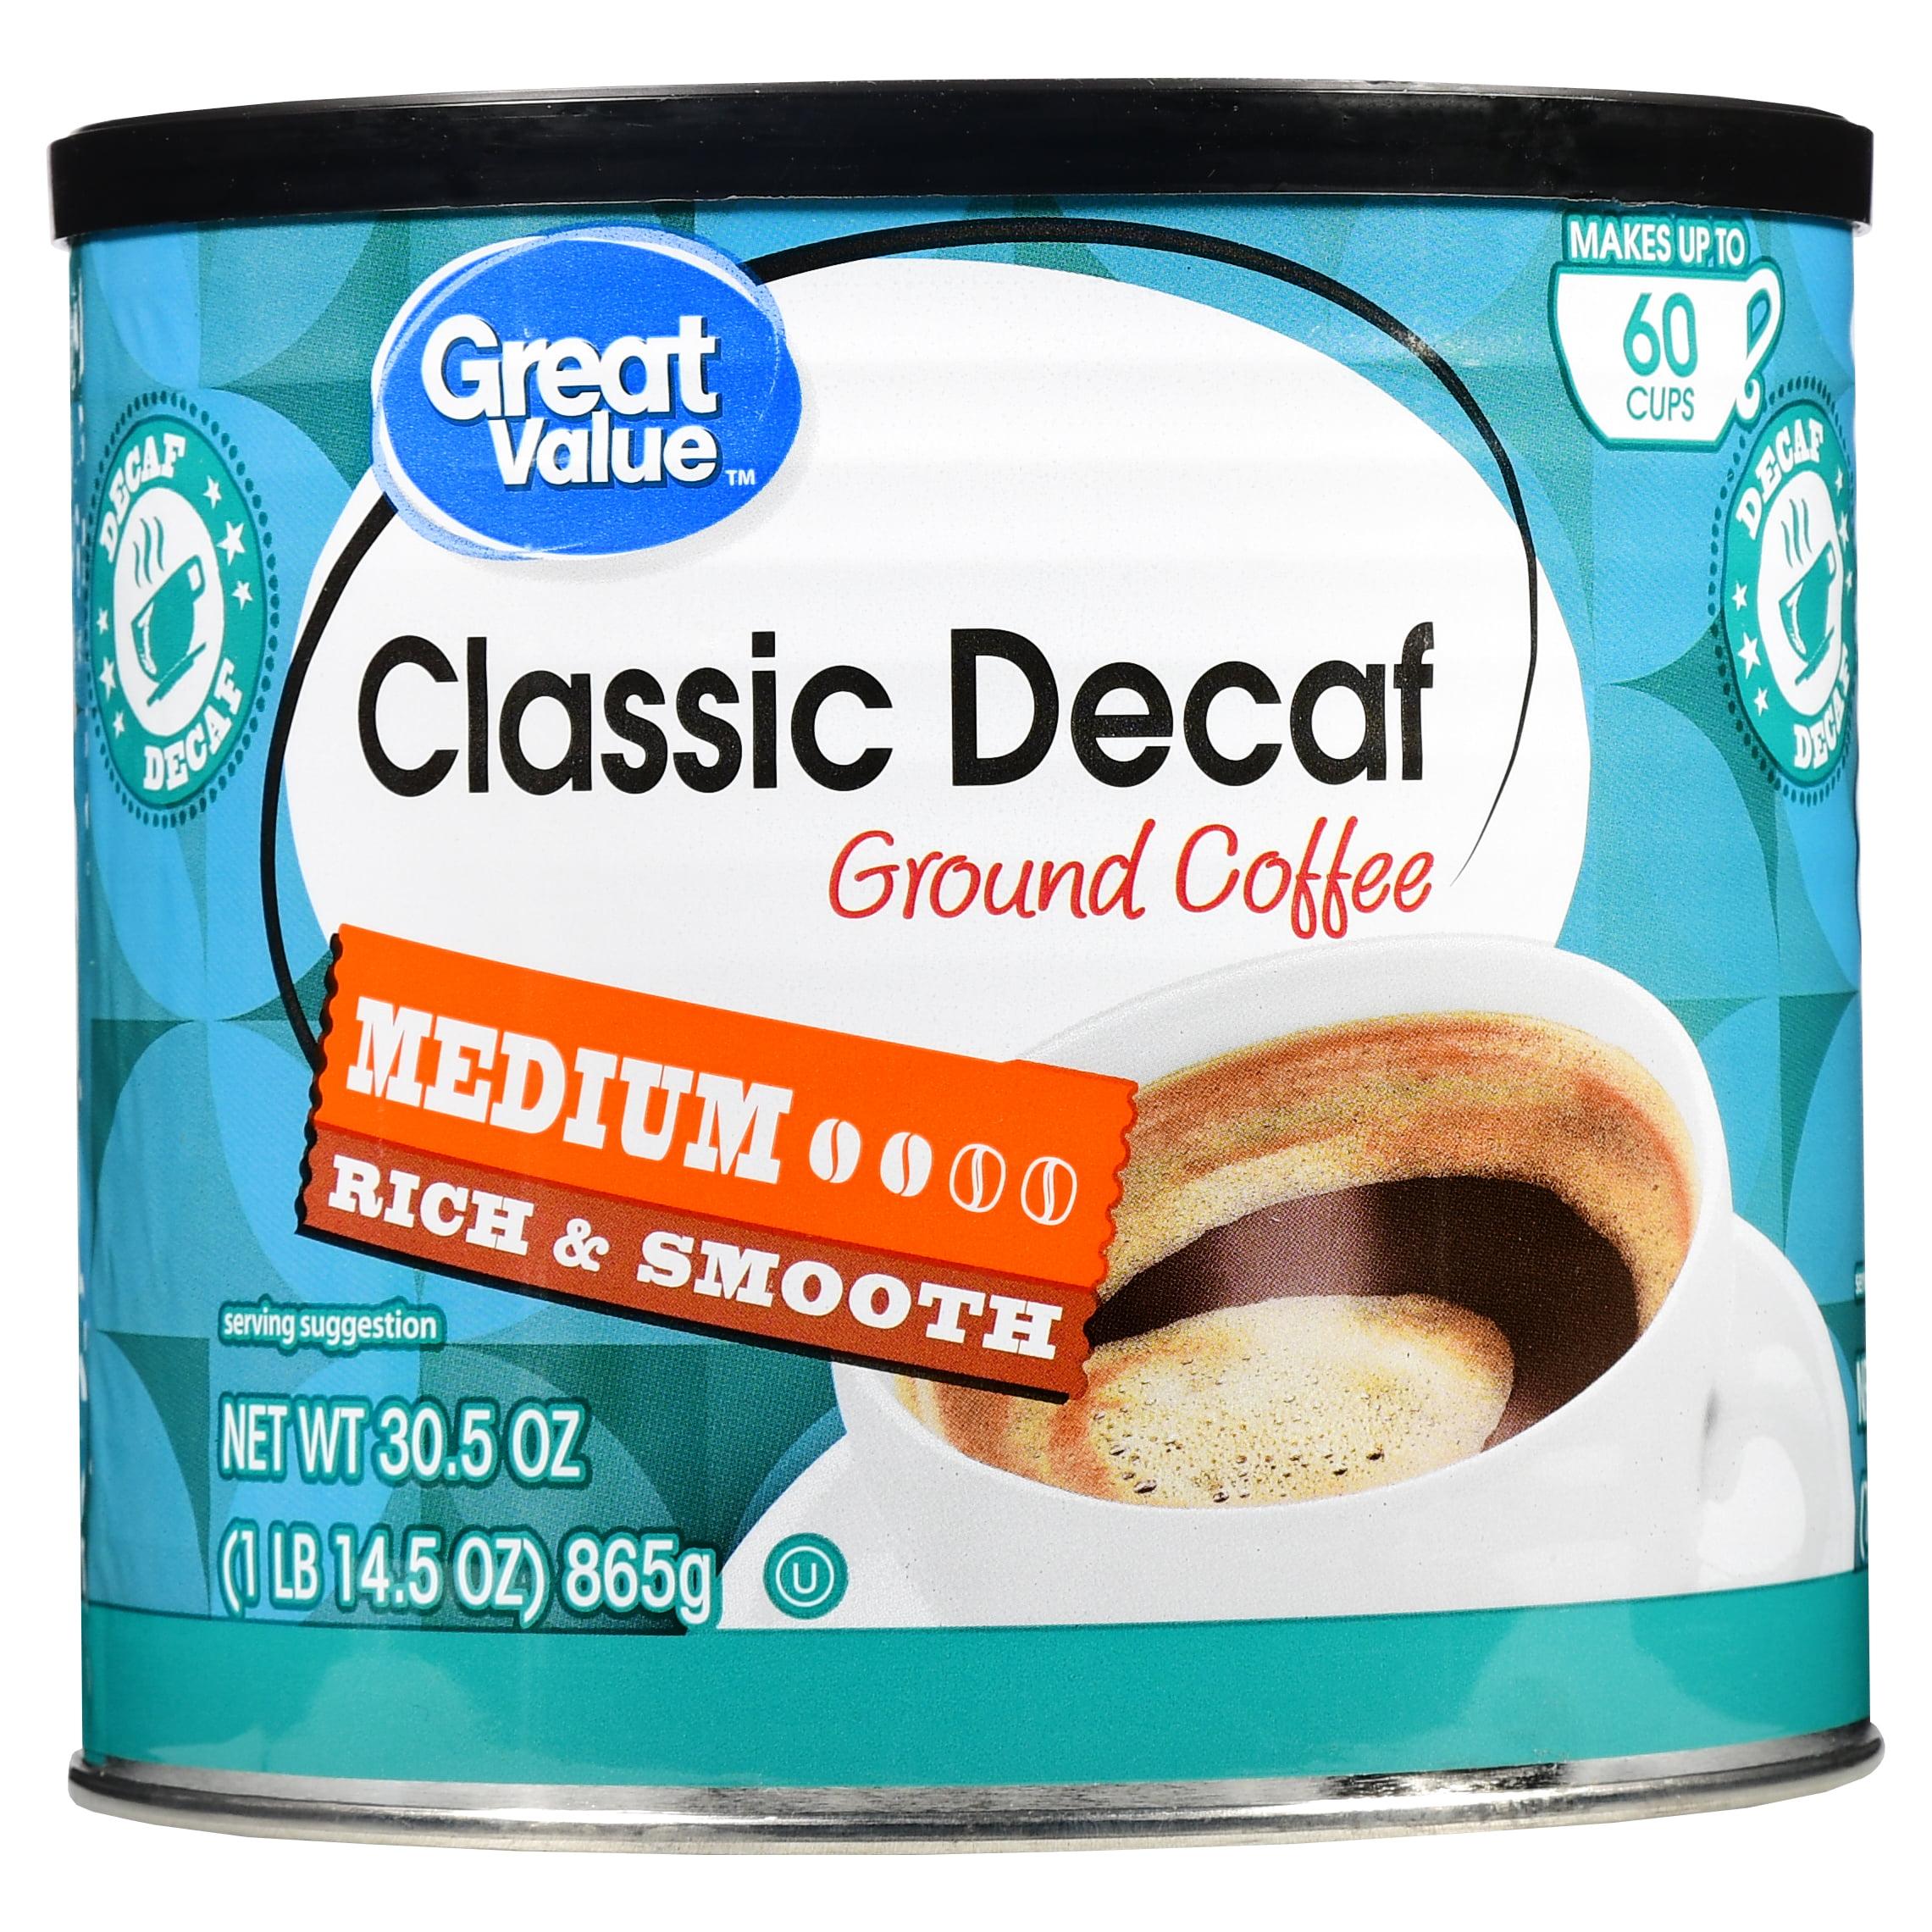 Great Value Classic Decaf Ground Coffee, Medium Roast, 30.5 oz